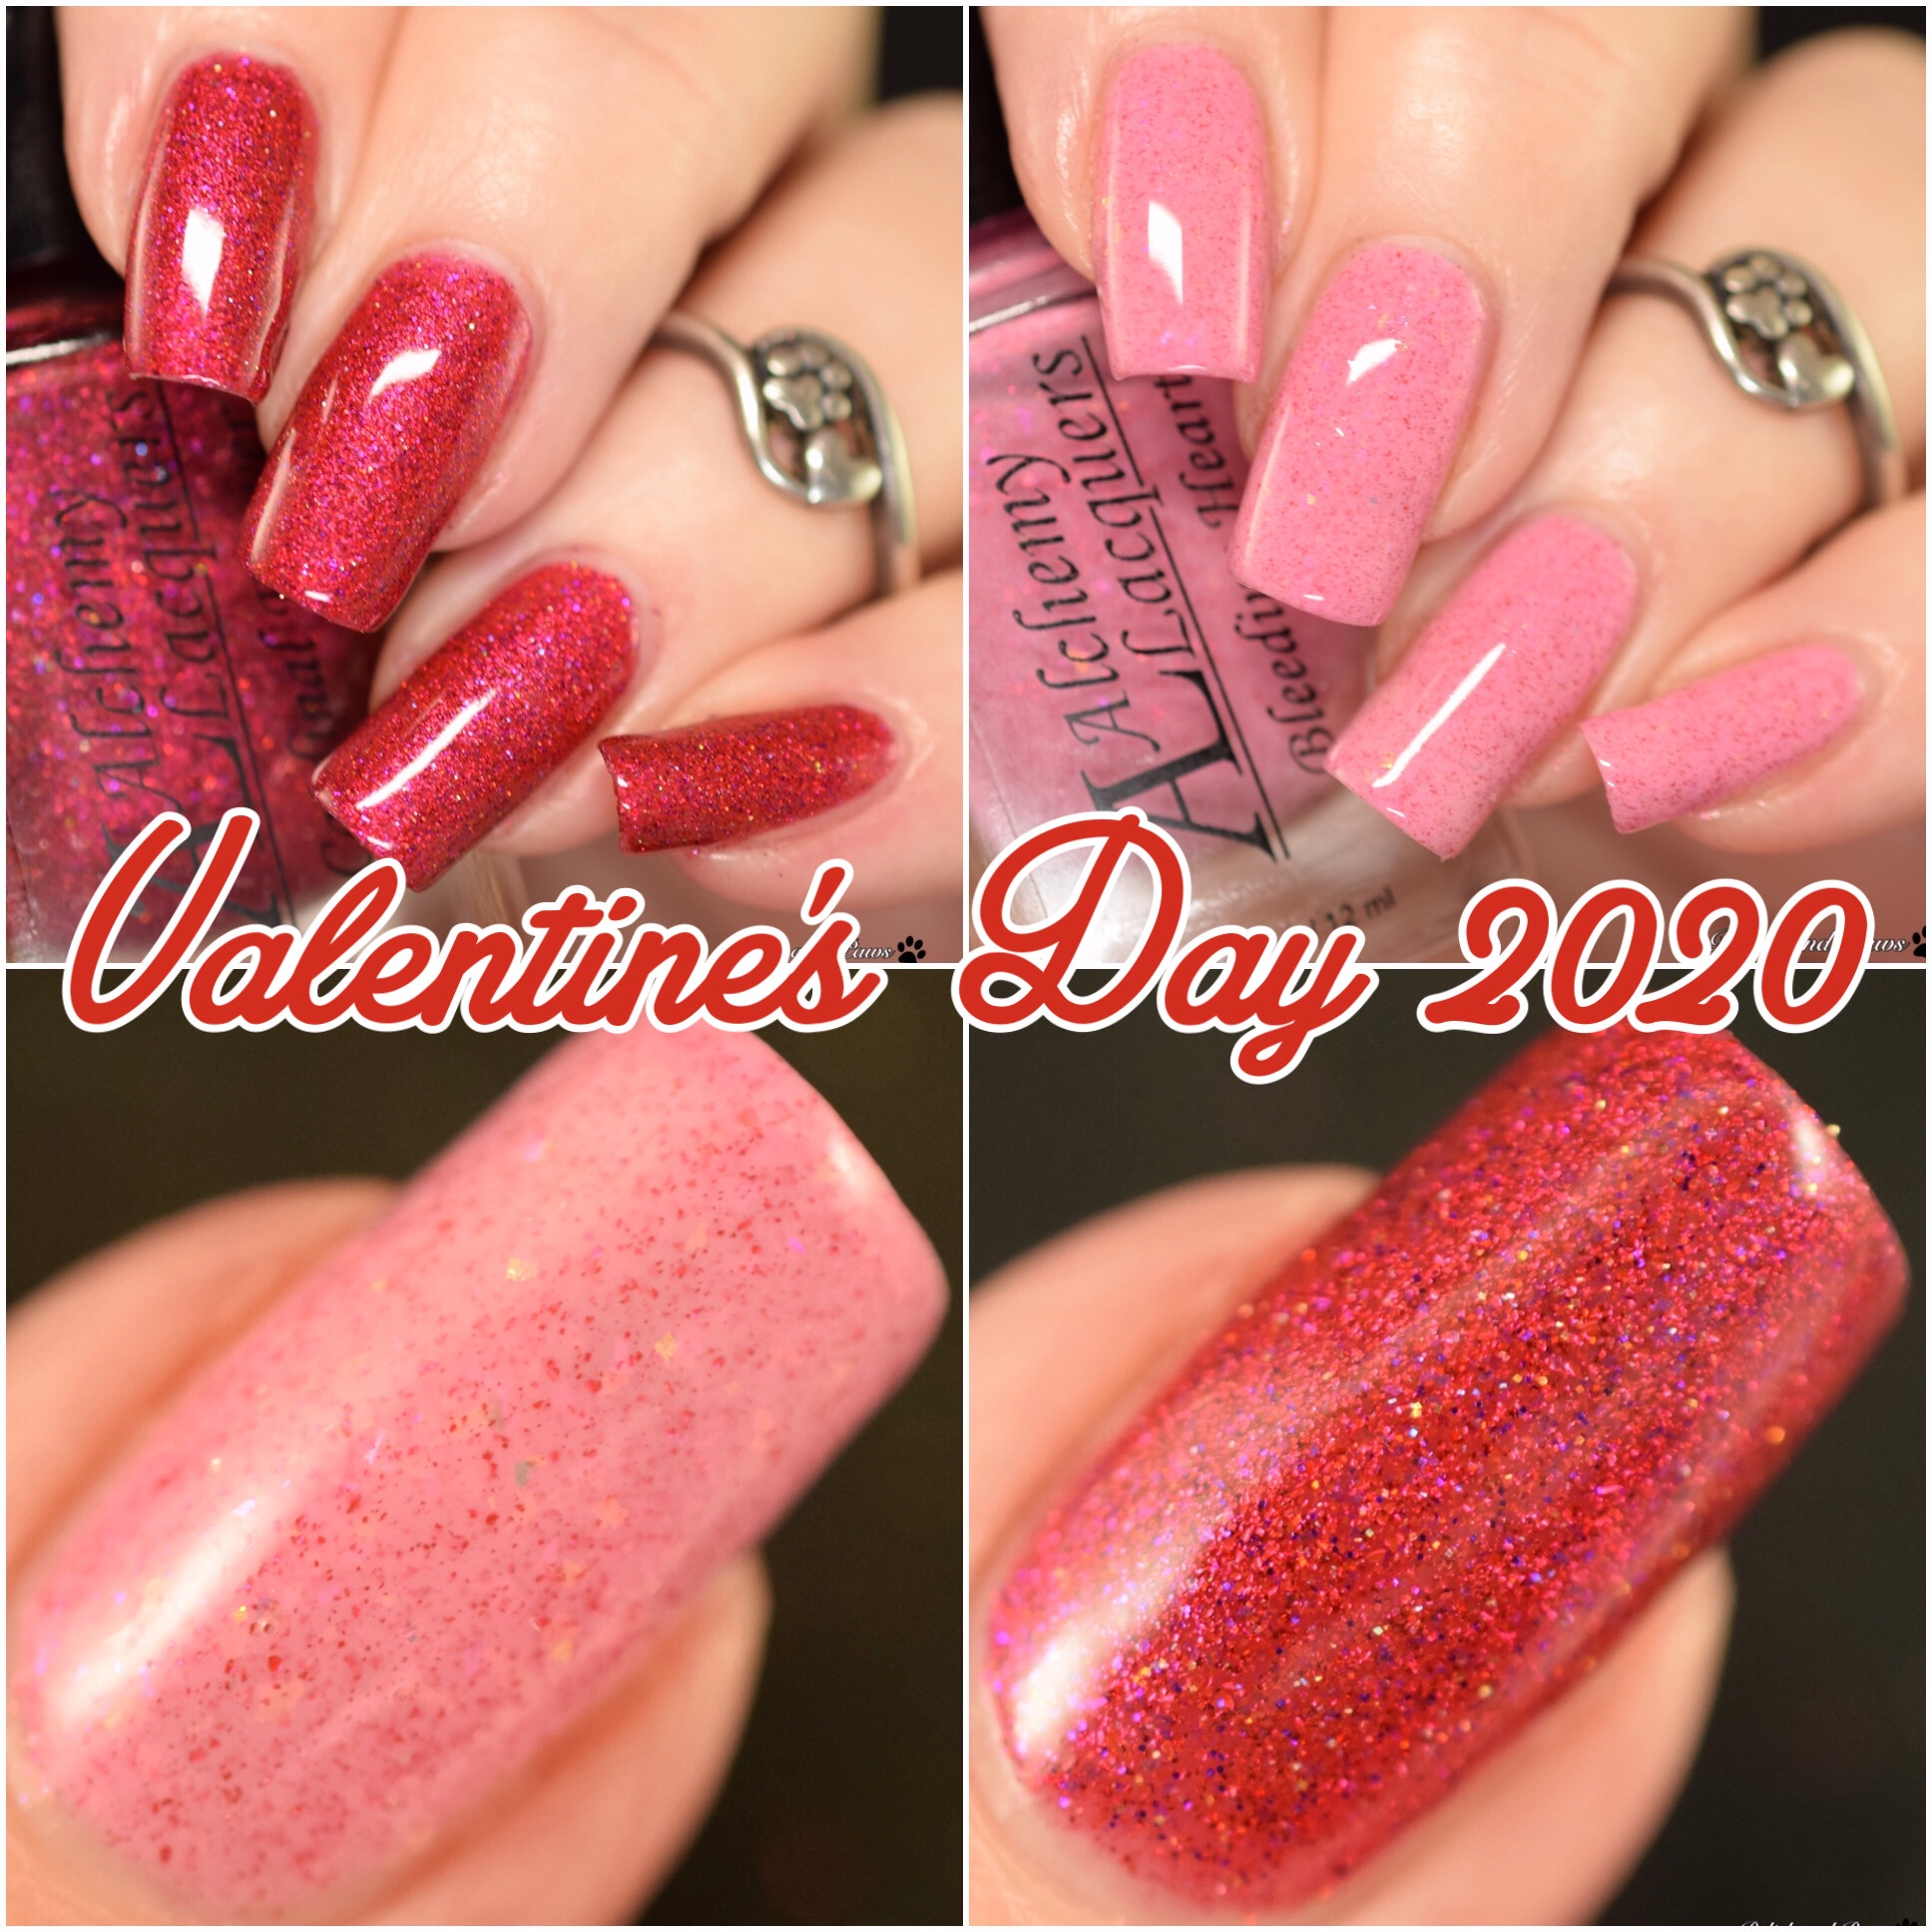 Valentine's Day 2020 Release